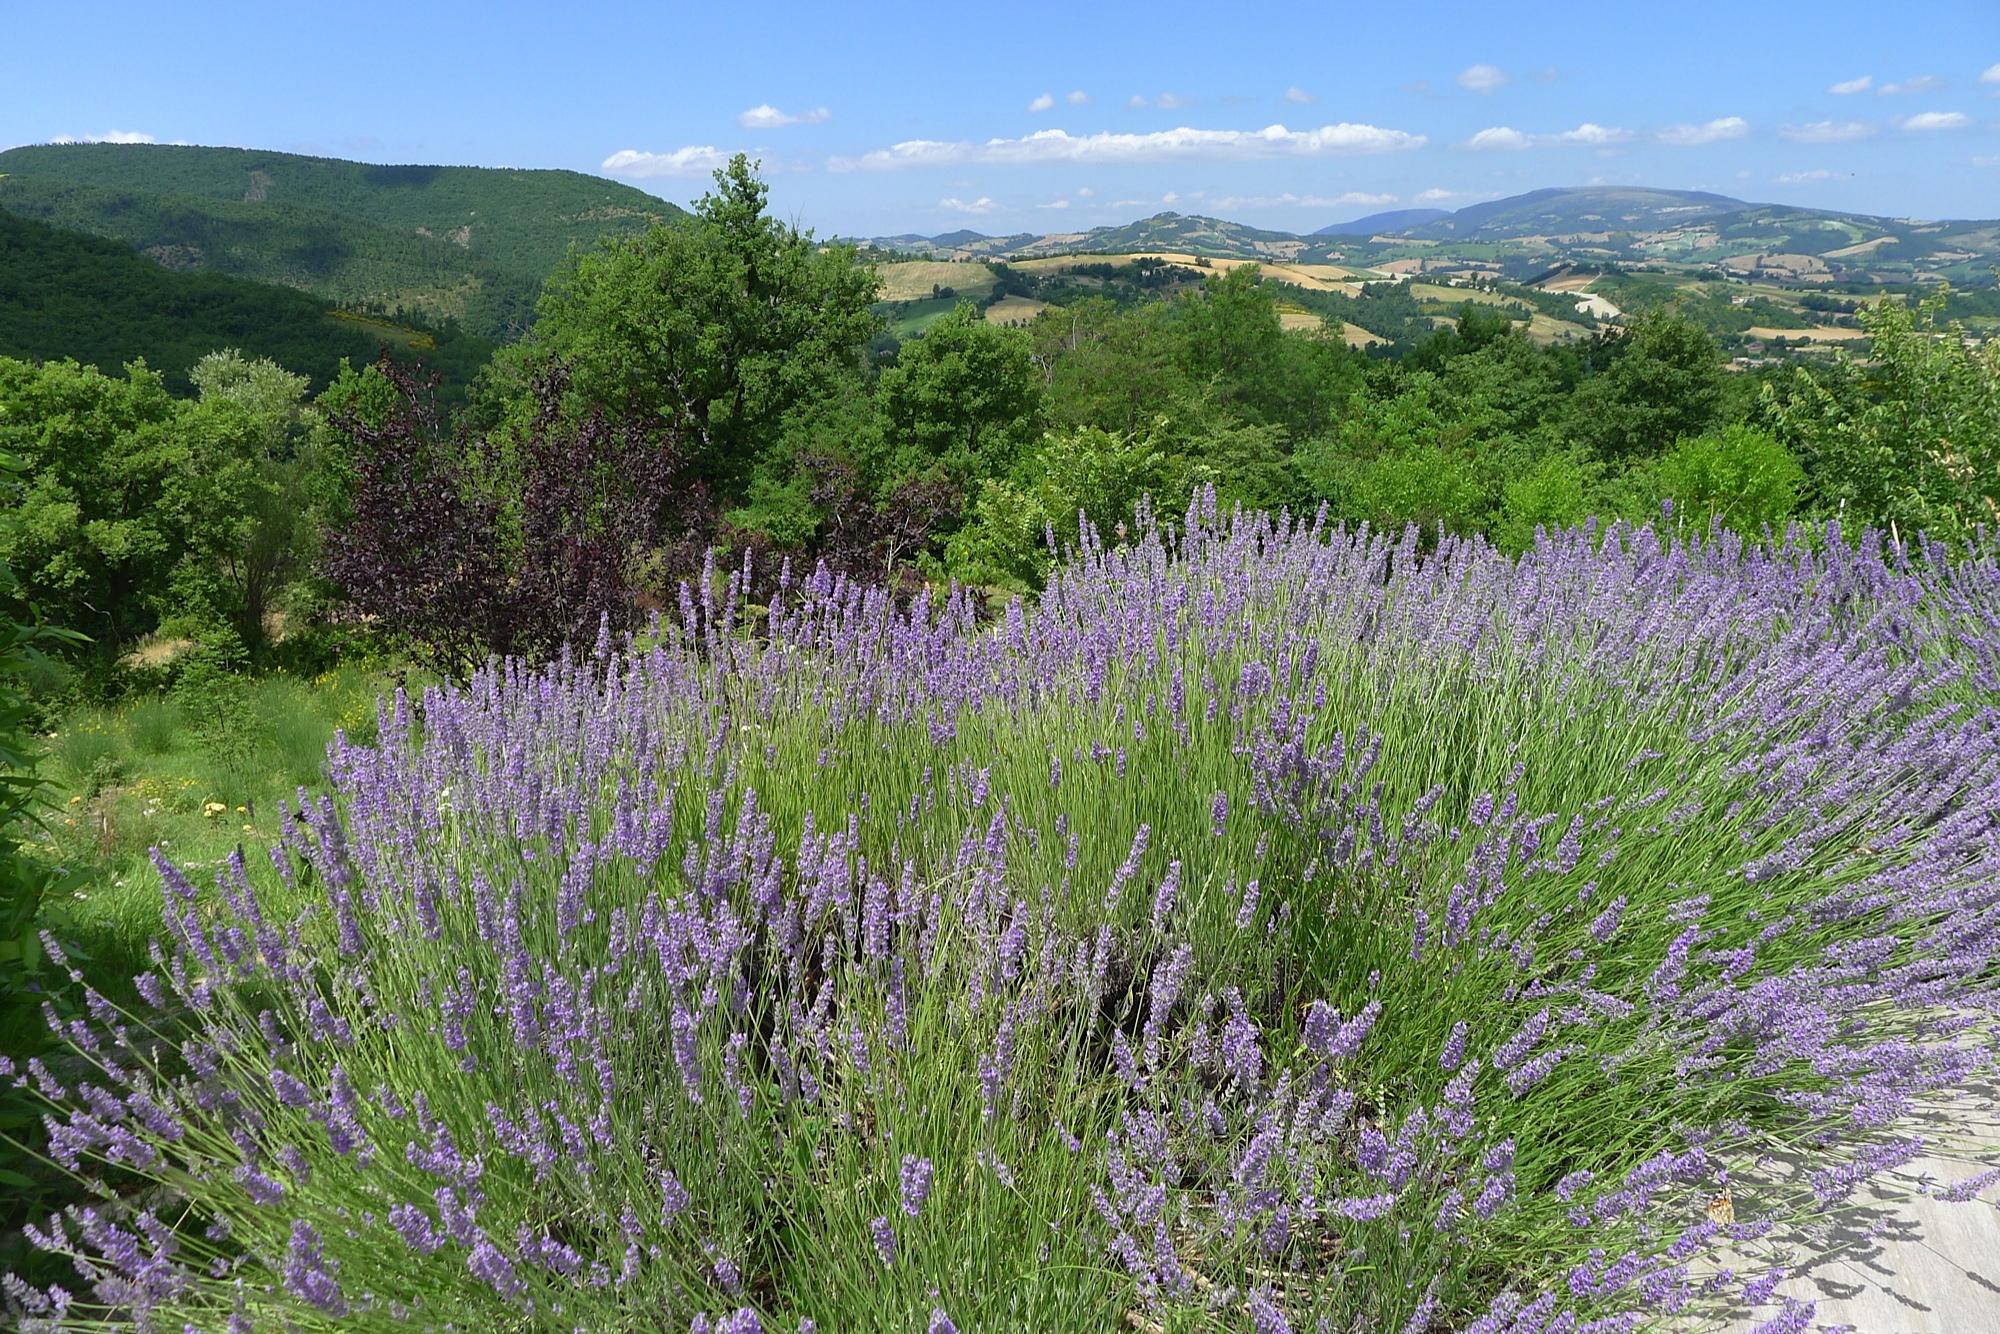 Juli 2014: Villa Nesplolo - tuinieren in terra cotta